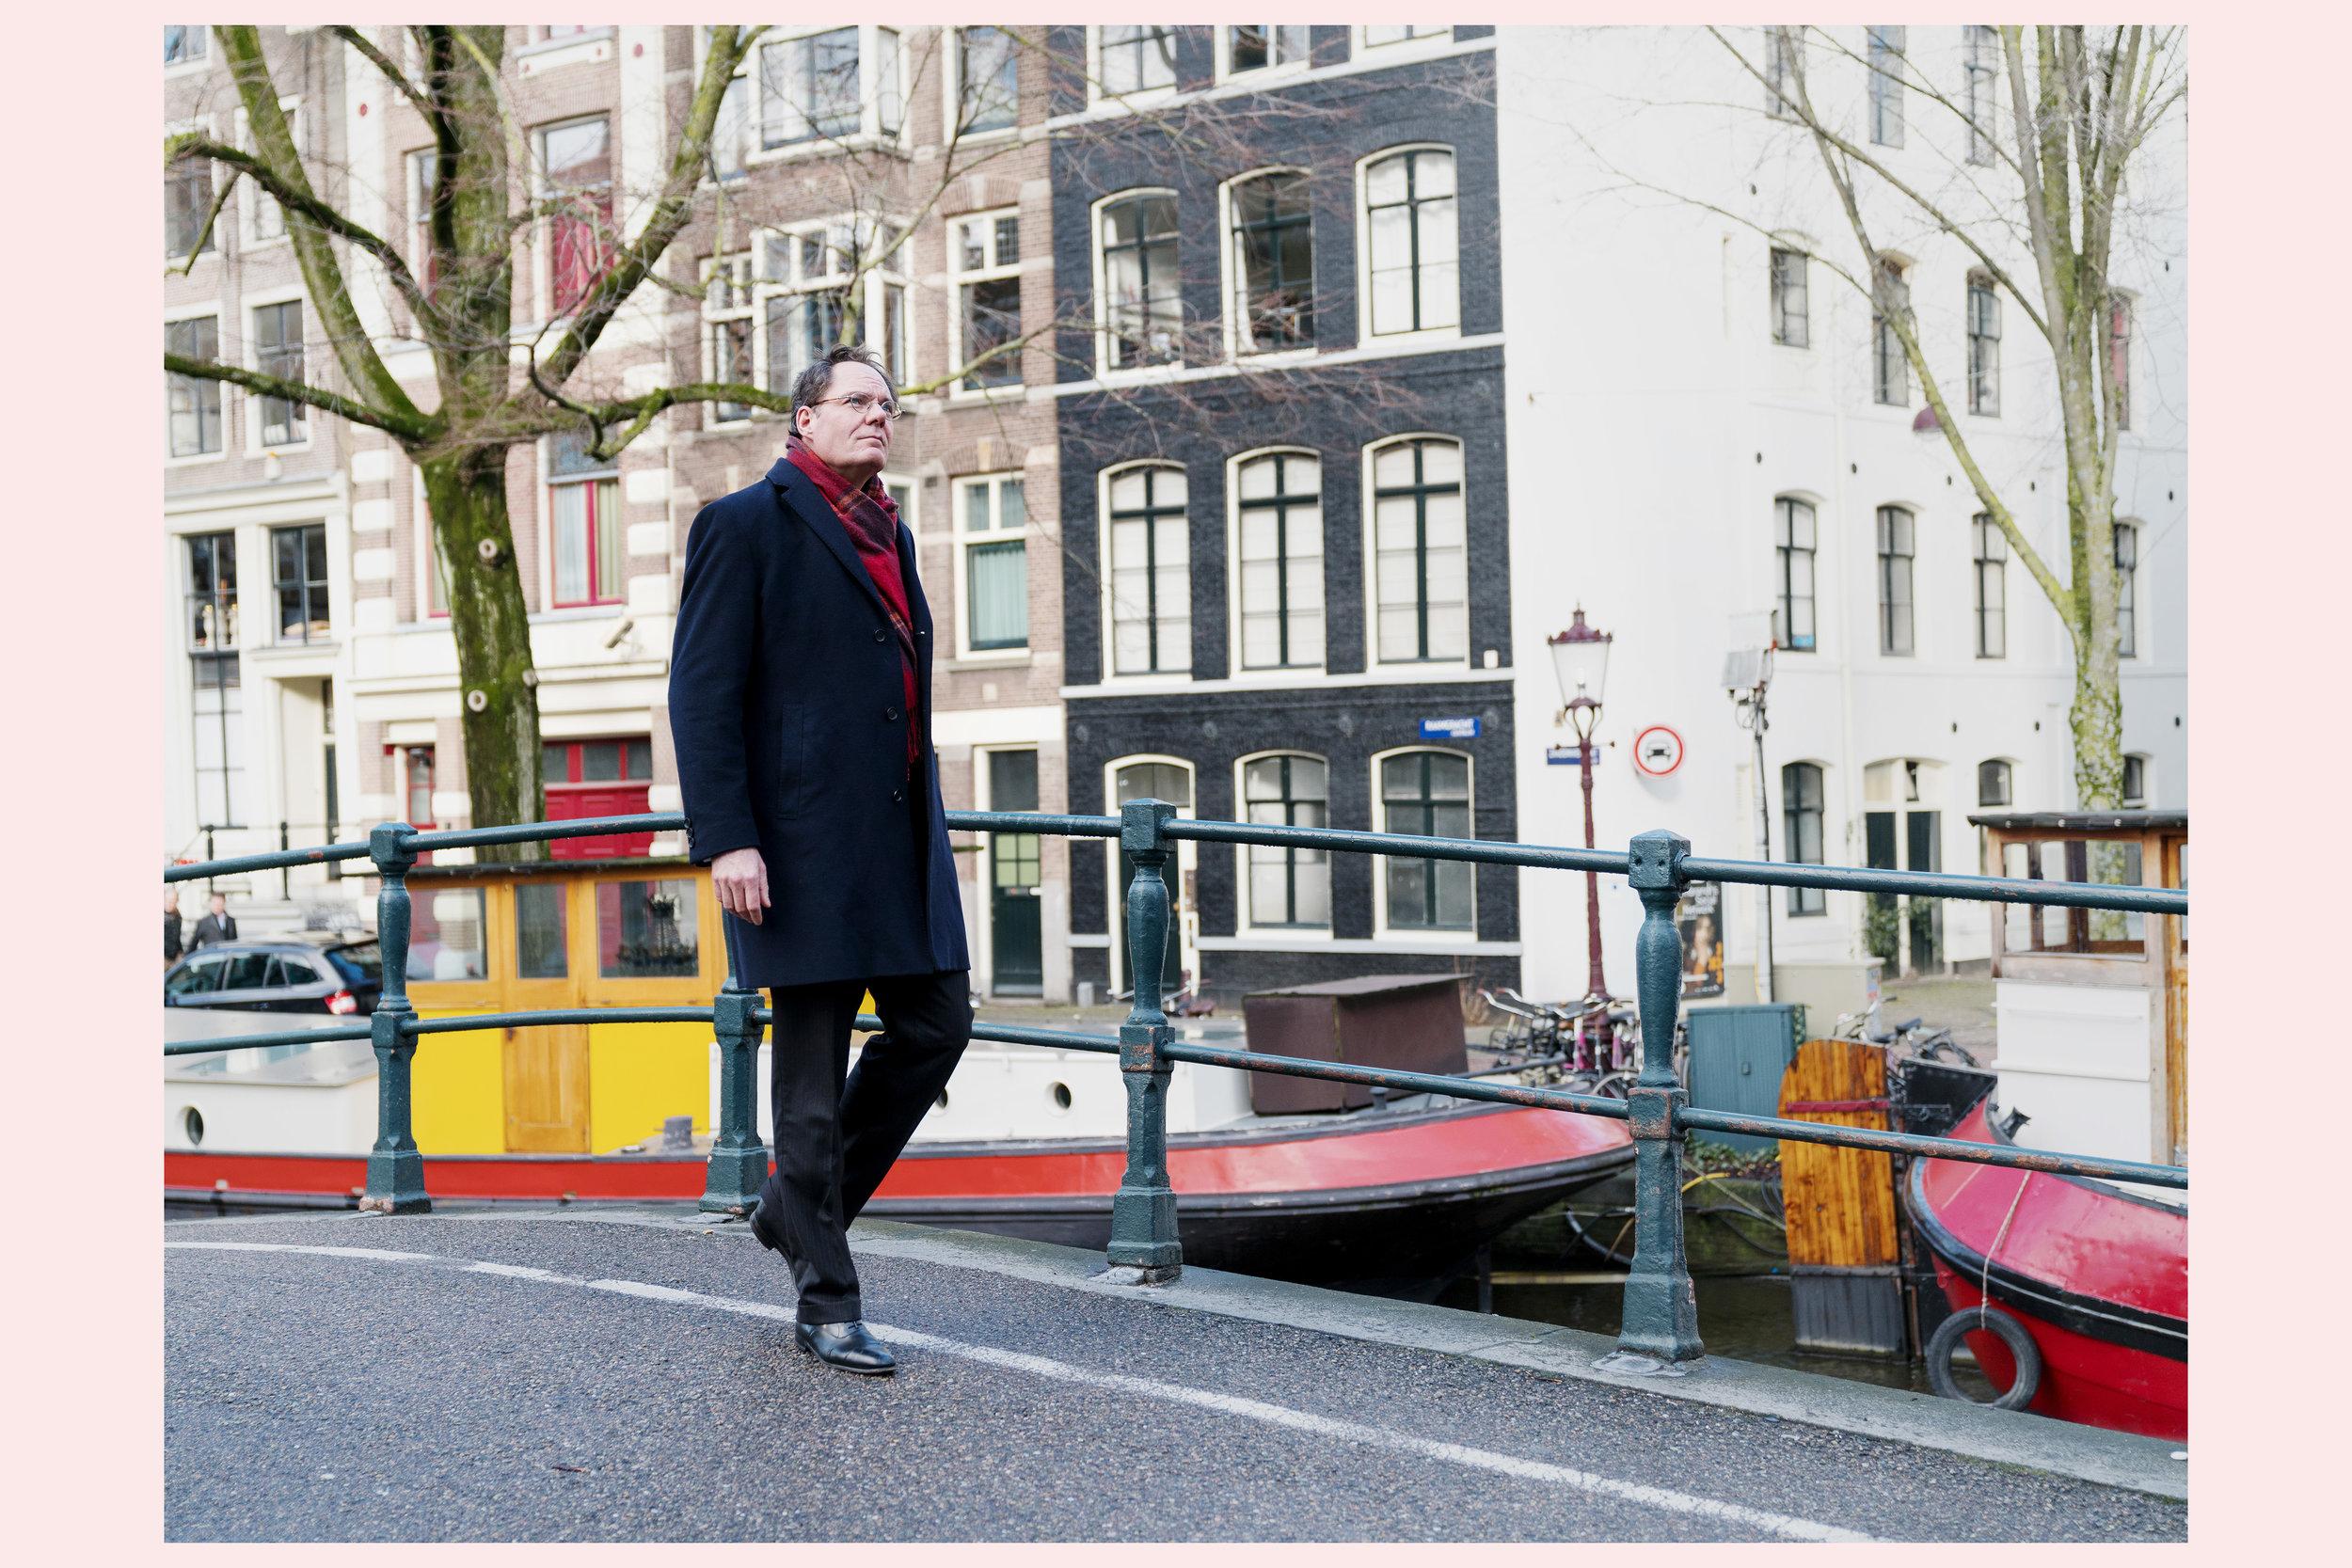 Udo Kock Debuty Mayor od Amsterdam for The New York Times.